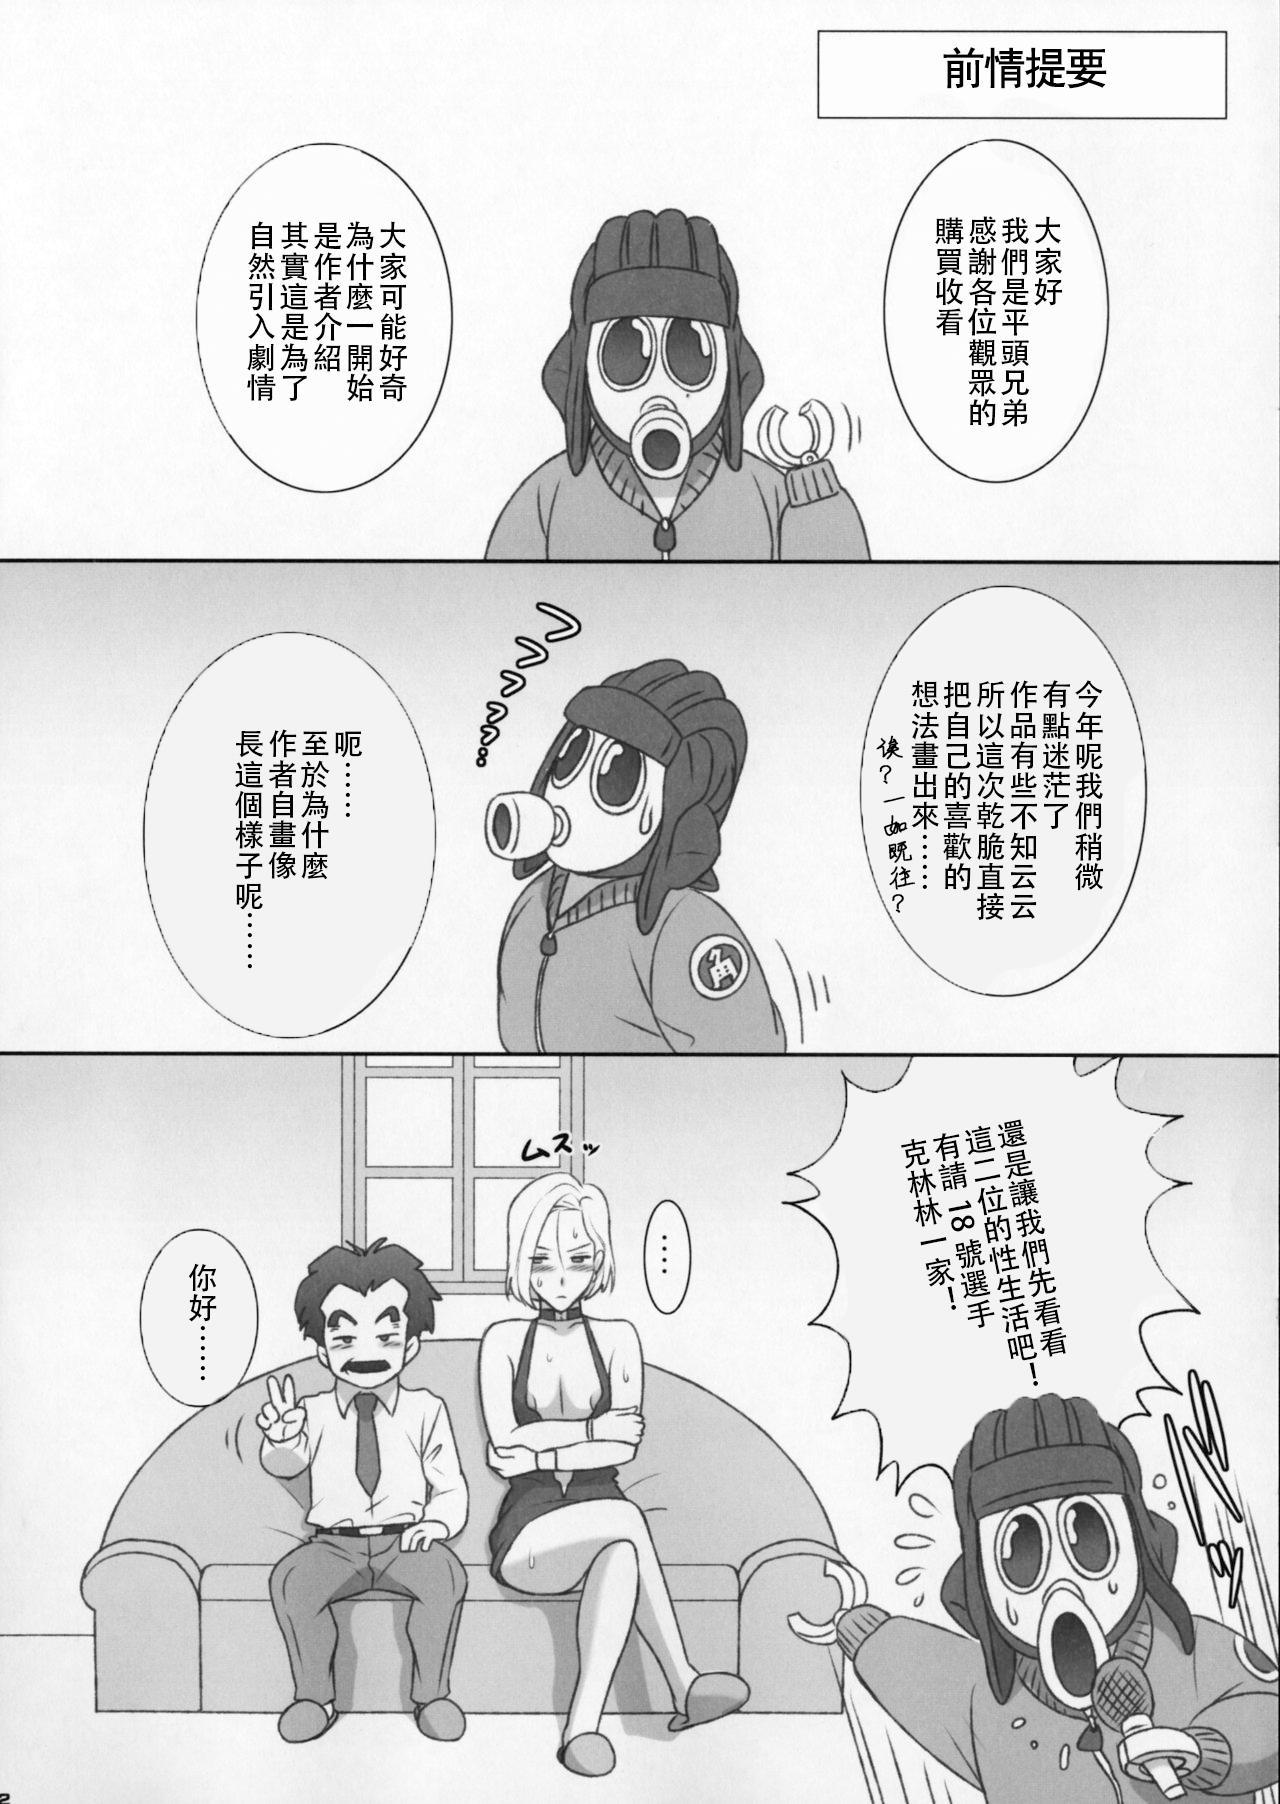 (C91) [Niku Ringo (Kakugari Kyoudai)] NIPPON NYAN NYAN BALL Z (Dragon Ball Z)[Chinese]【不可视汉化】 2